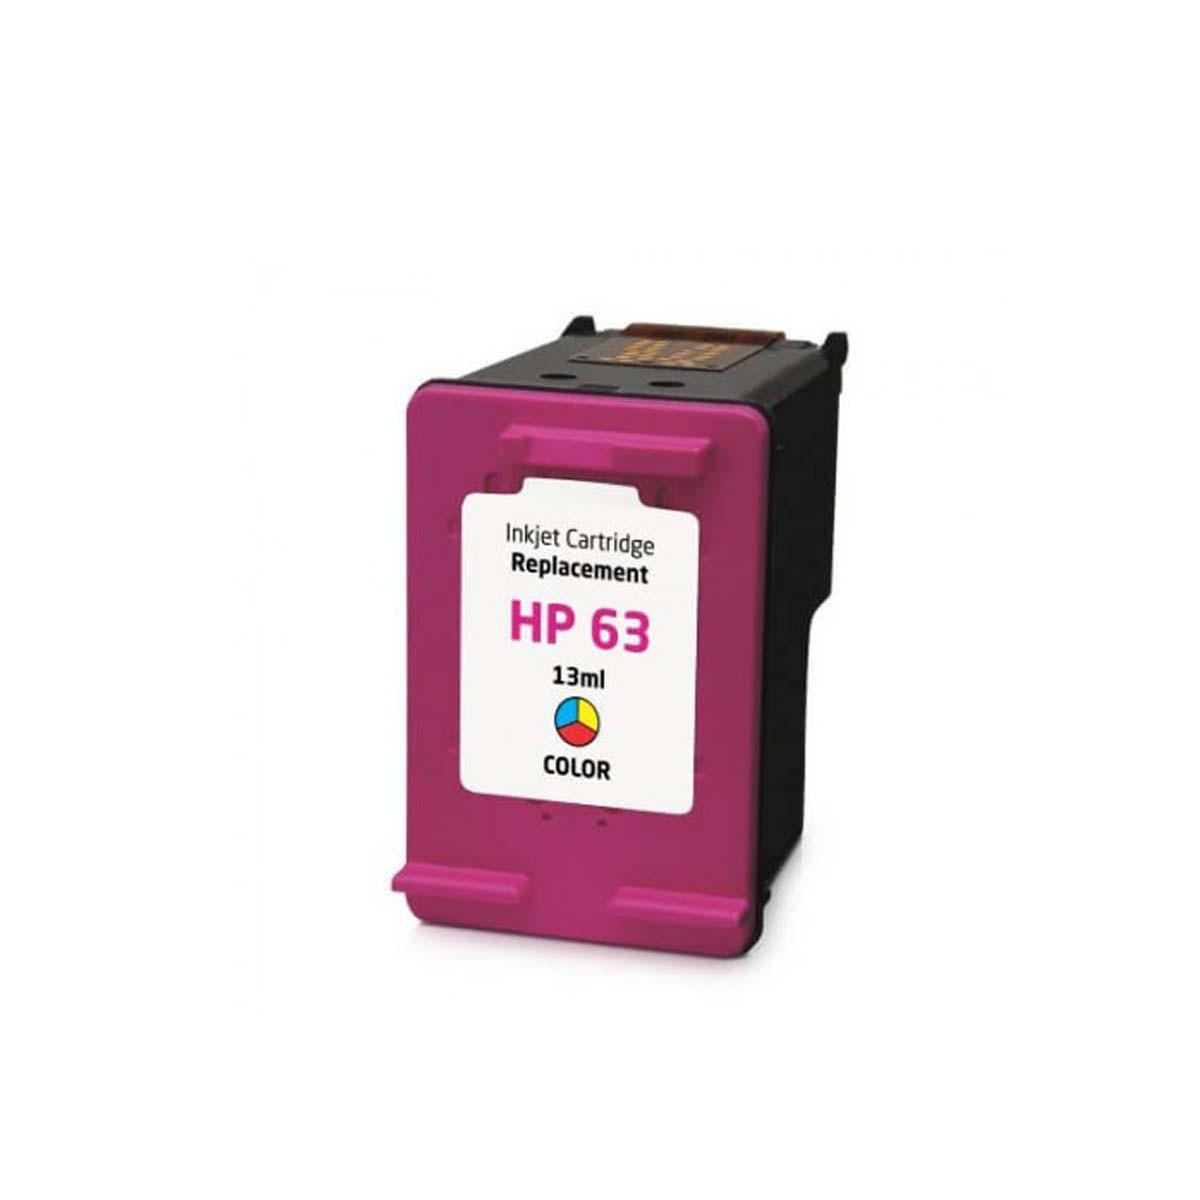 Cartucho de Tinta Compatível com HP 63 F6U61 Colorido Office Jet 4655 4650 DeskJet 2130 2132 | 13ml